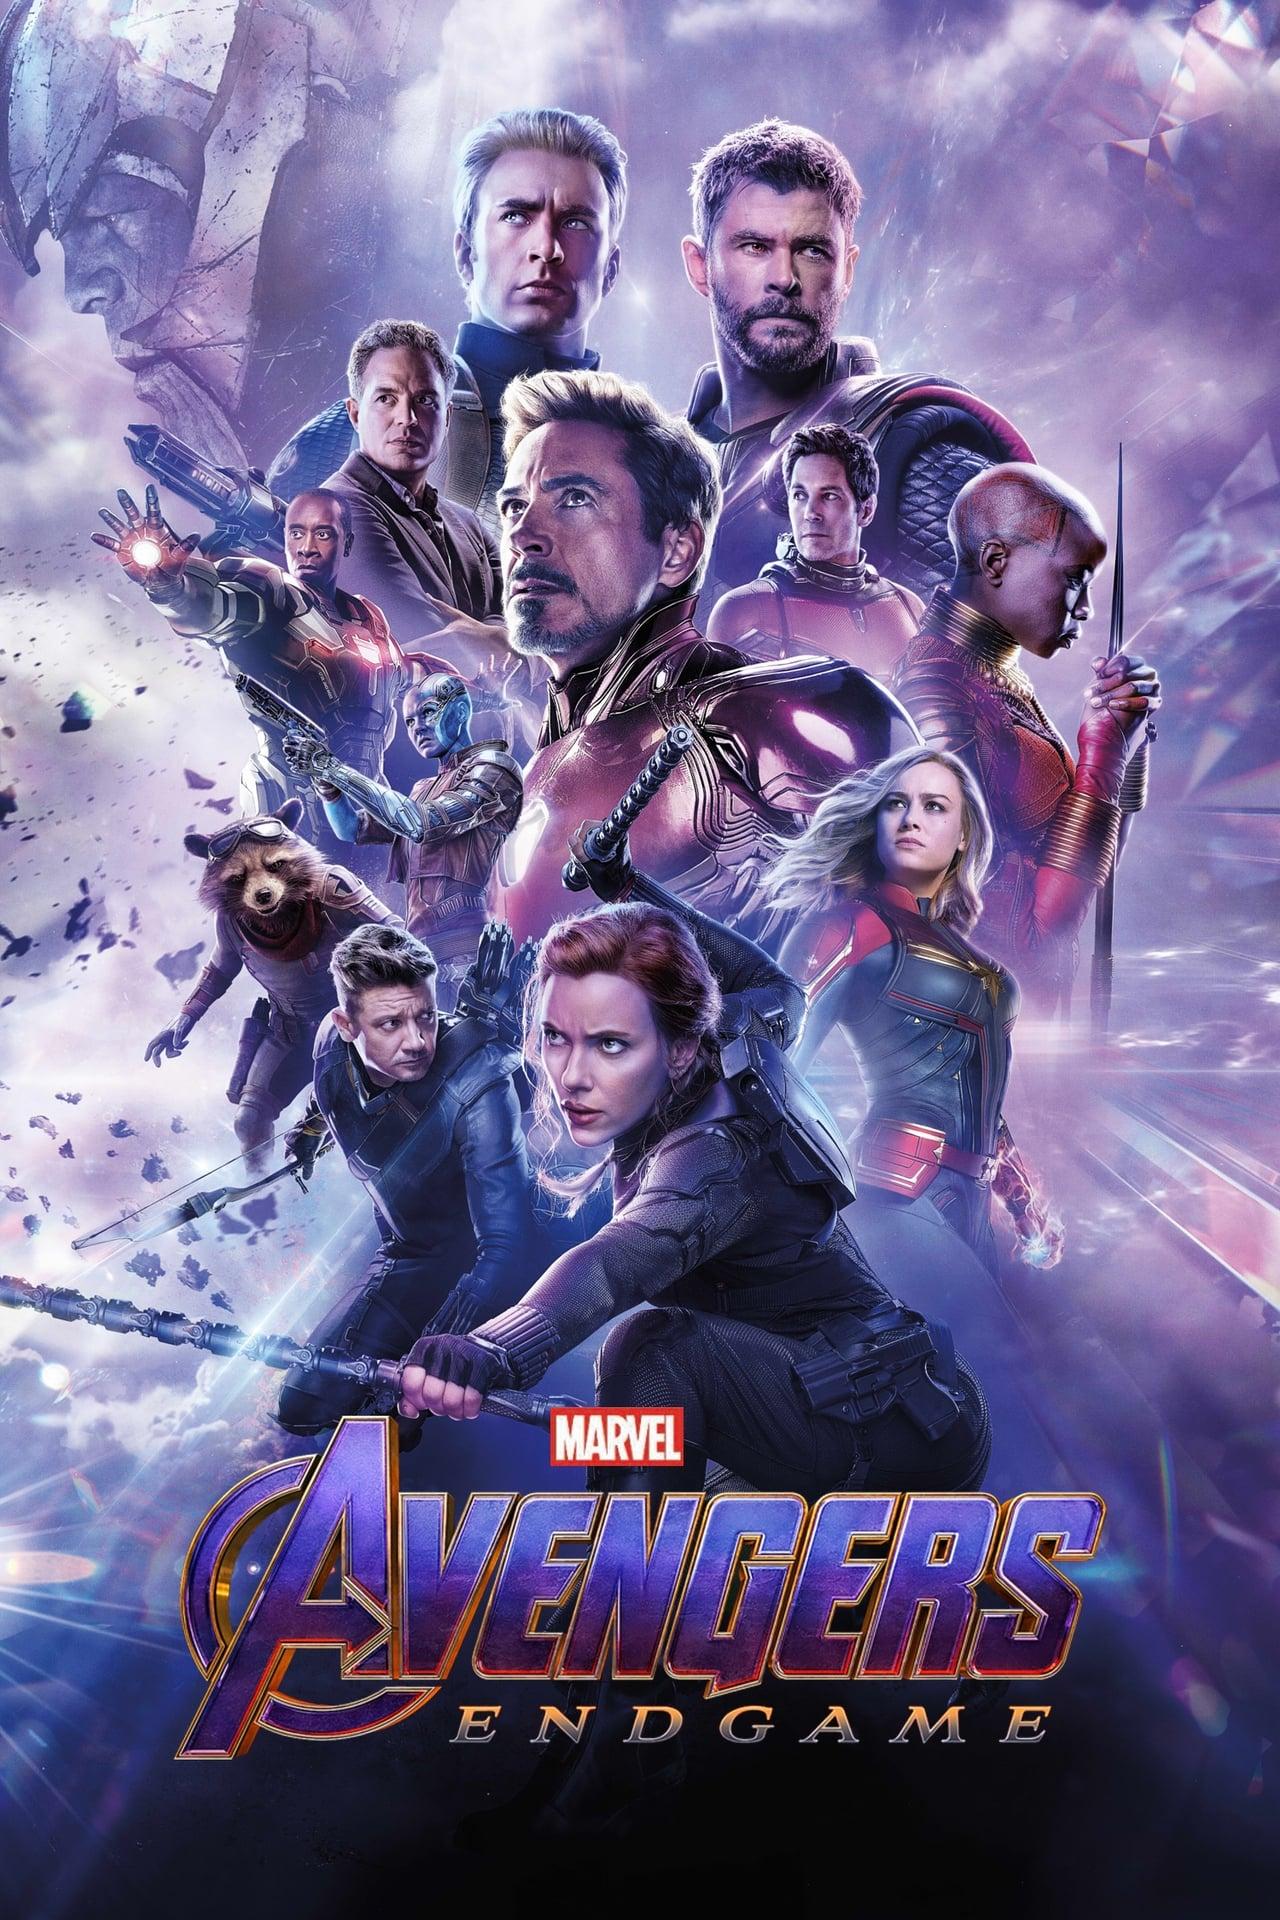 avengers: endgame subtitles english | opensubtitles